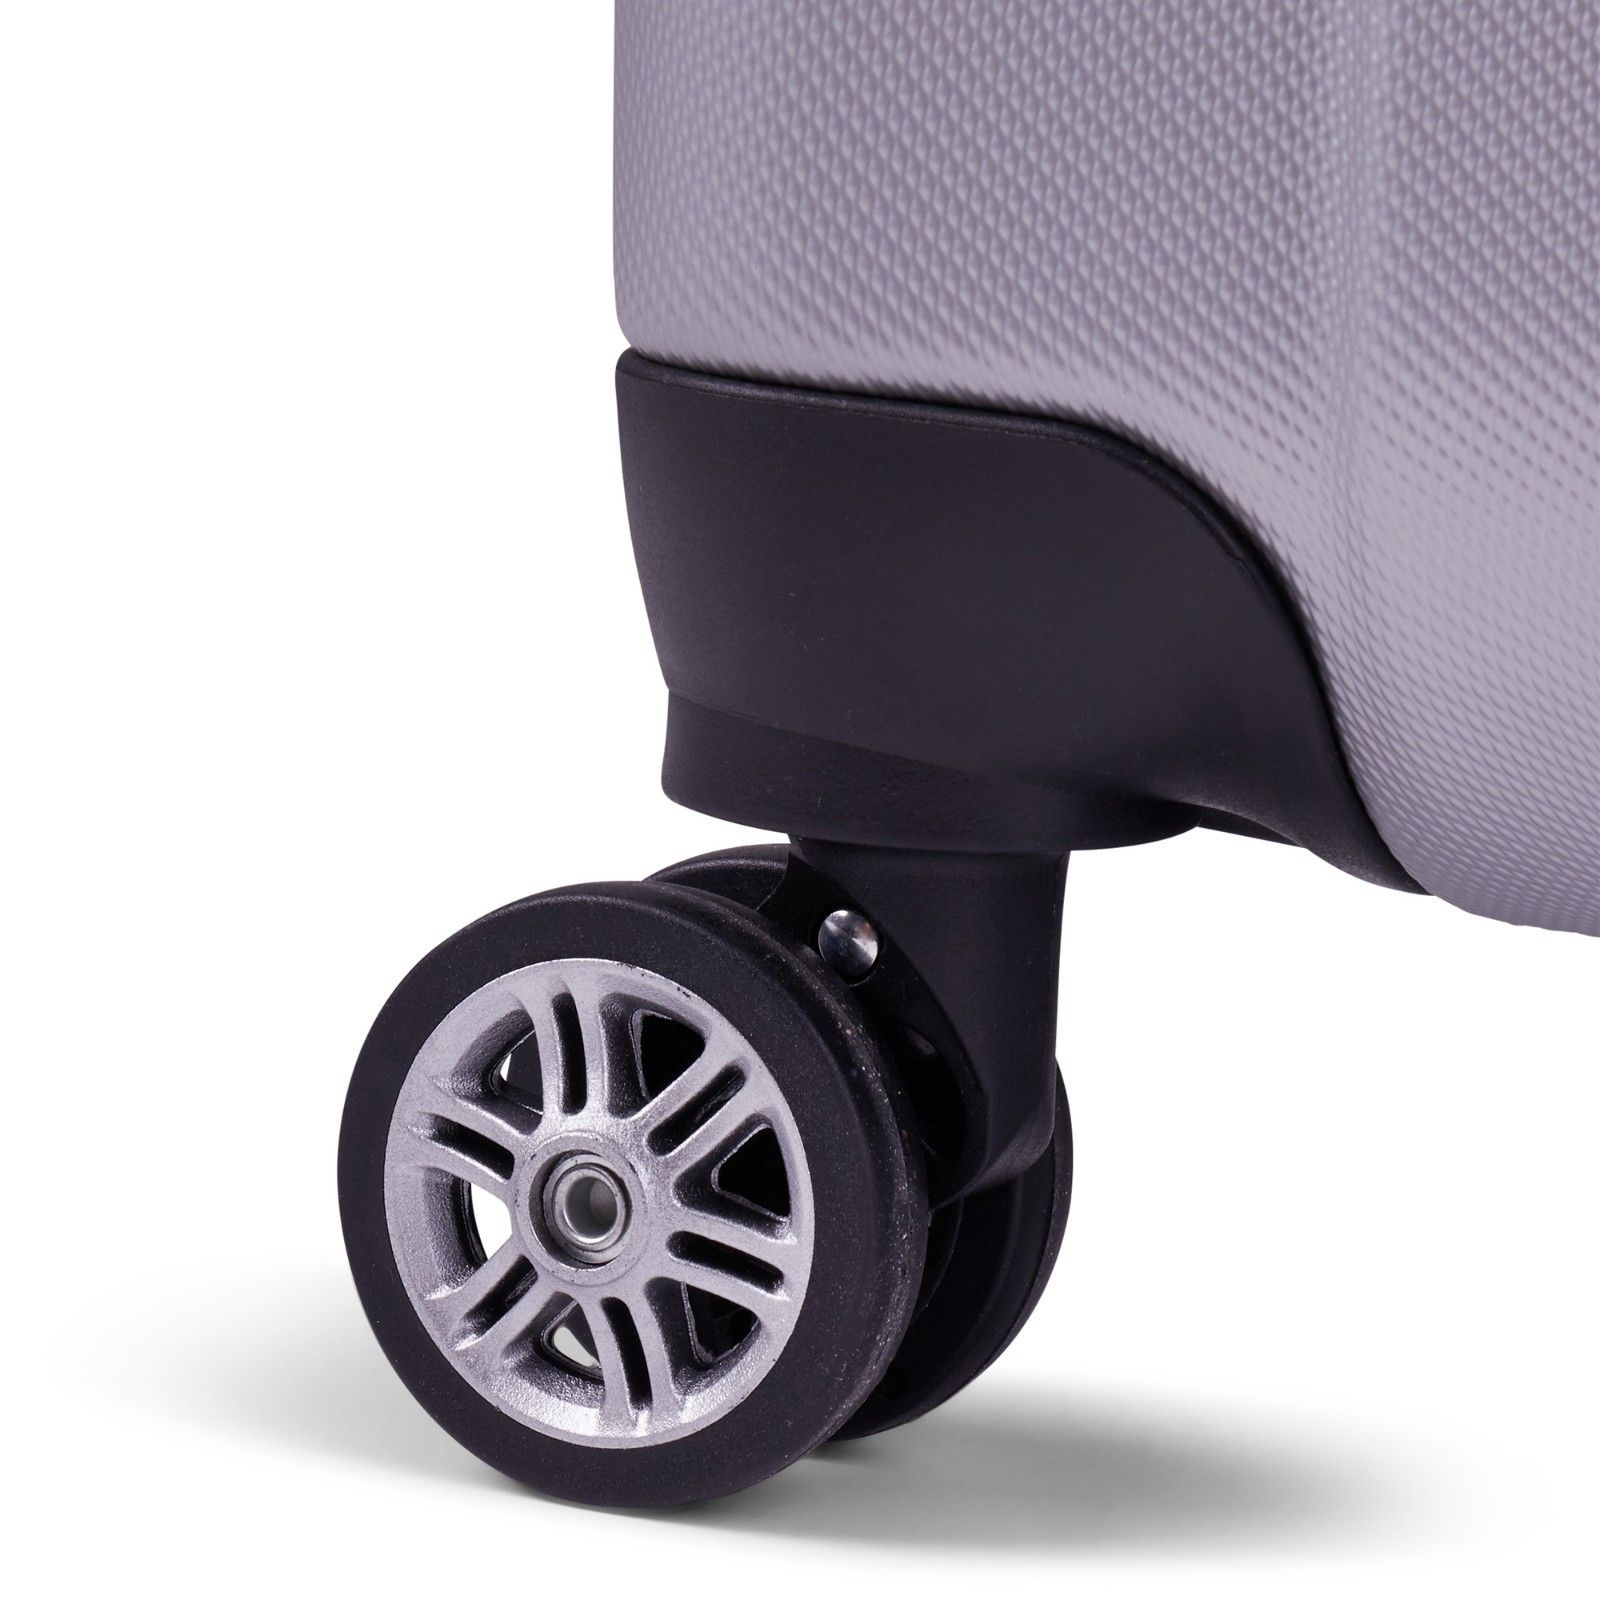 Milano-Premium-3pc-ABS-Luggage-Suitcase-Luxury-Hard-Case-Shockproof-Travel-Set thumbnail 37